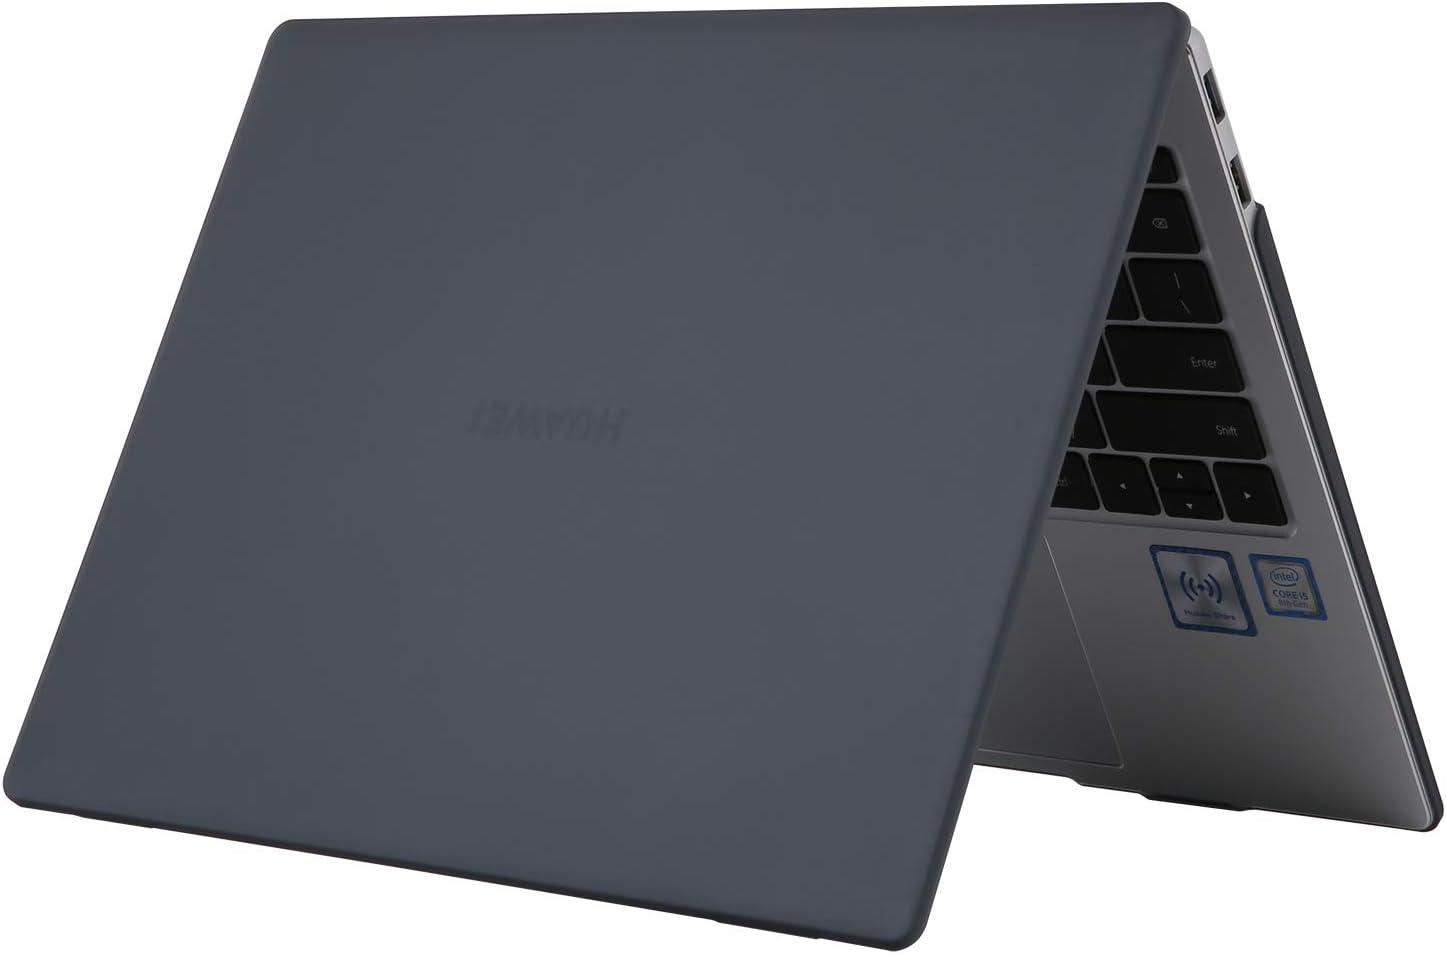 mCoque Custodie regide per Huawei 2020 MateBook D 14 Notebook Portatile 14, Transparente